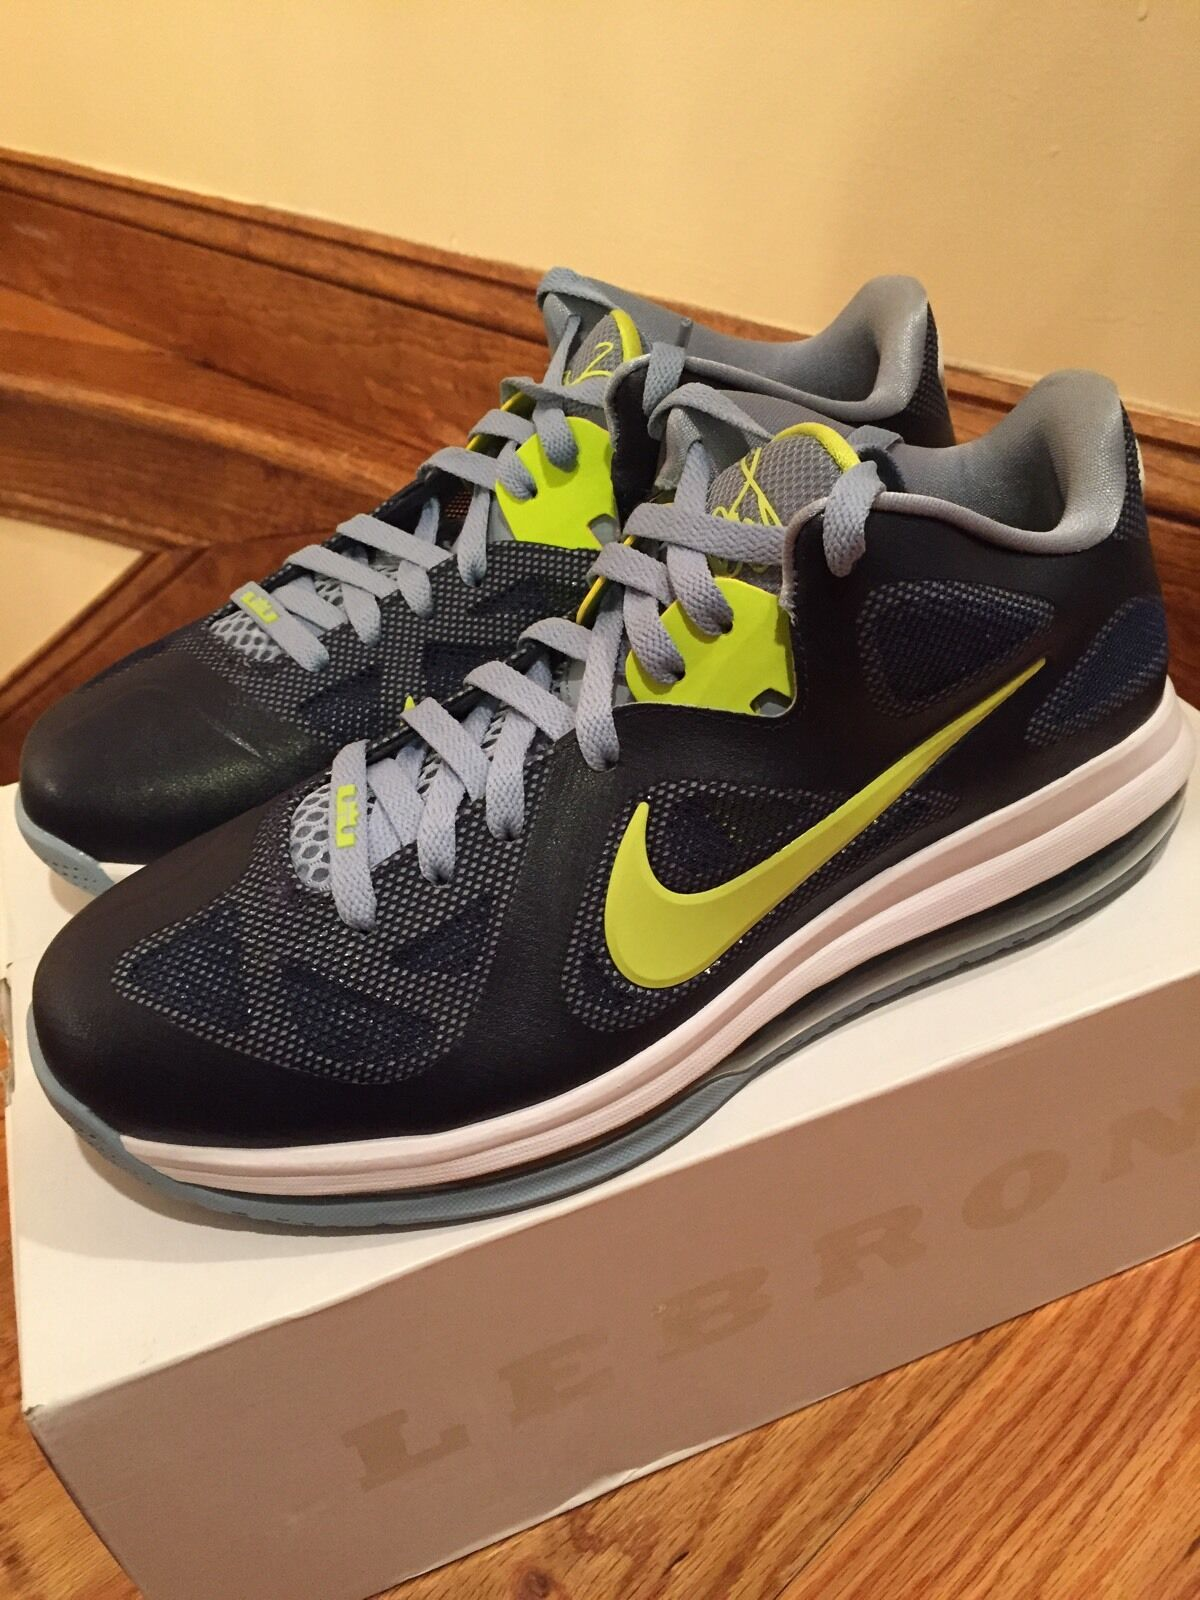 Nike Lebron 9 510811-401 SZ 9 Brand New, DS